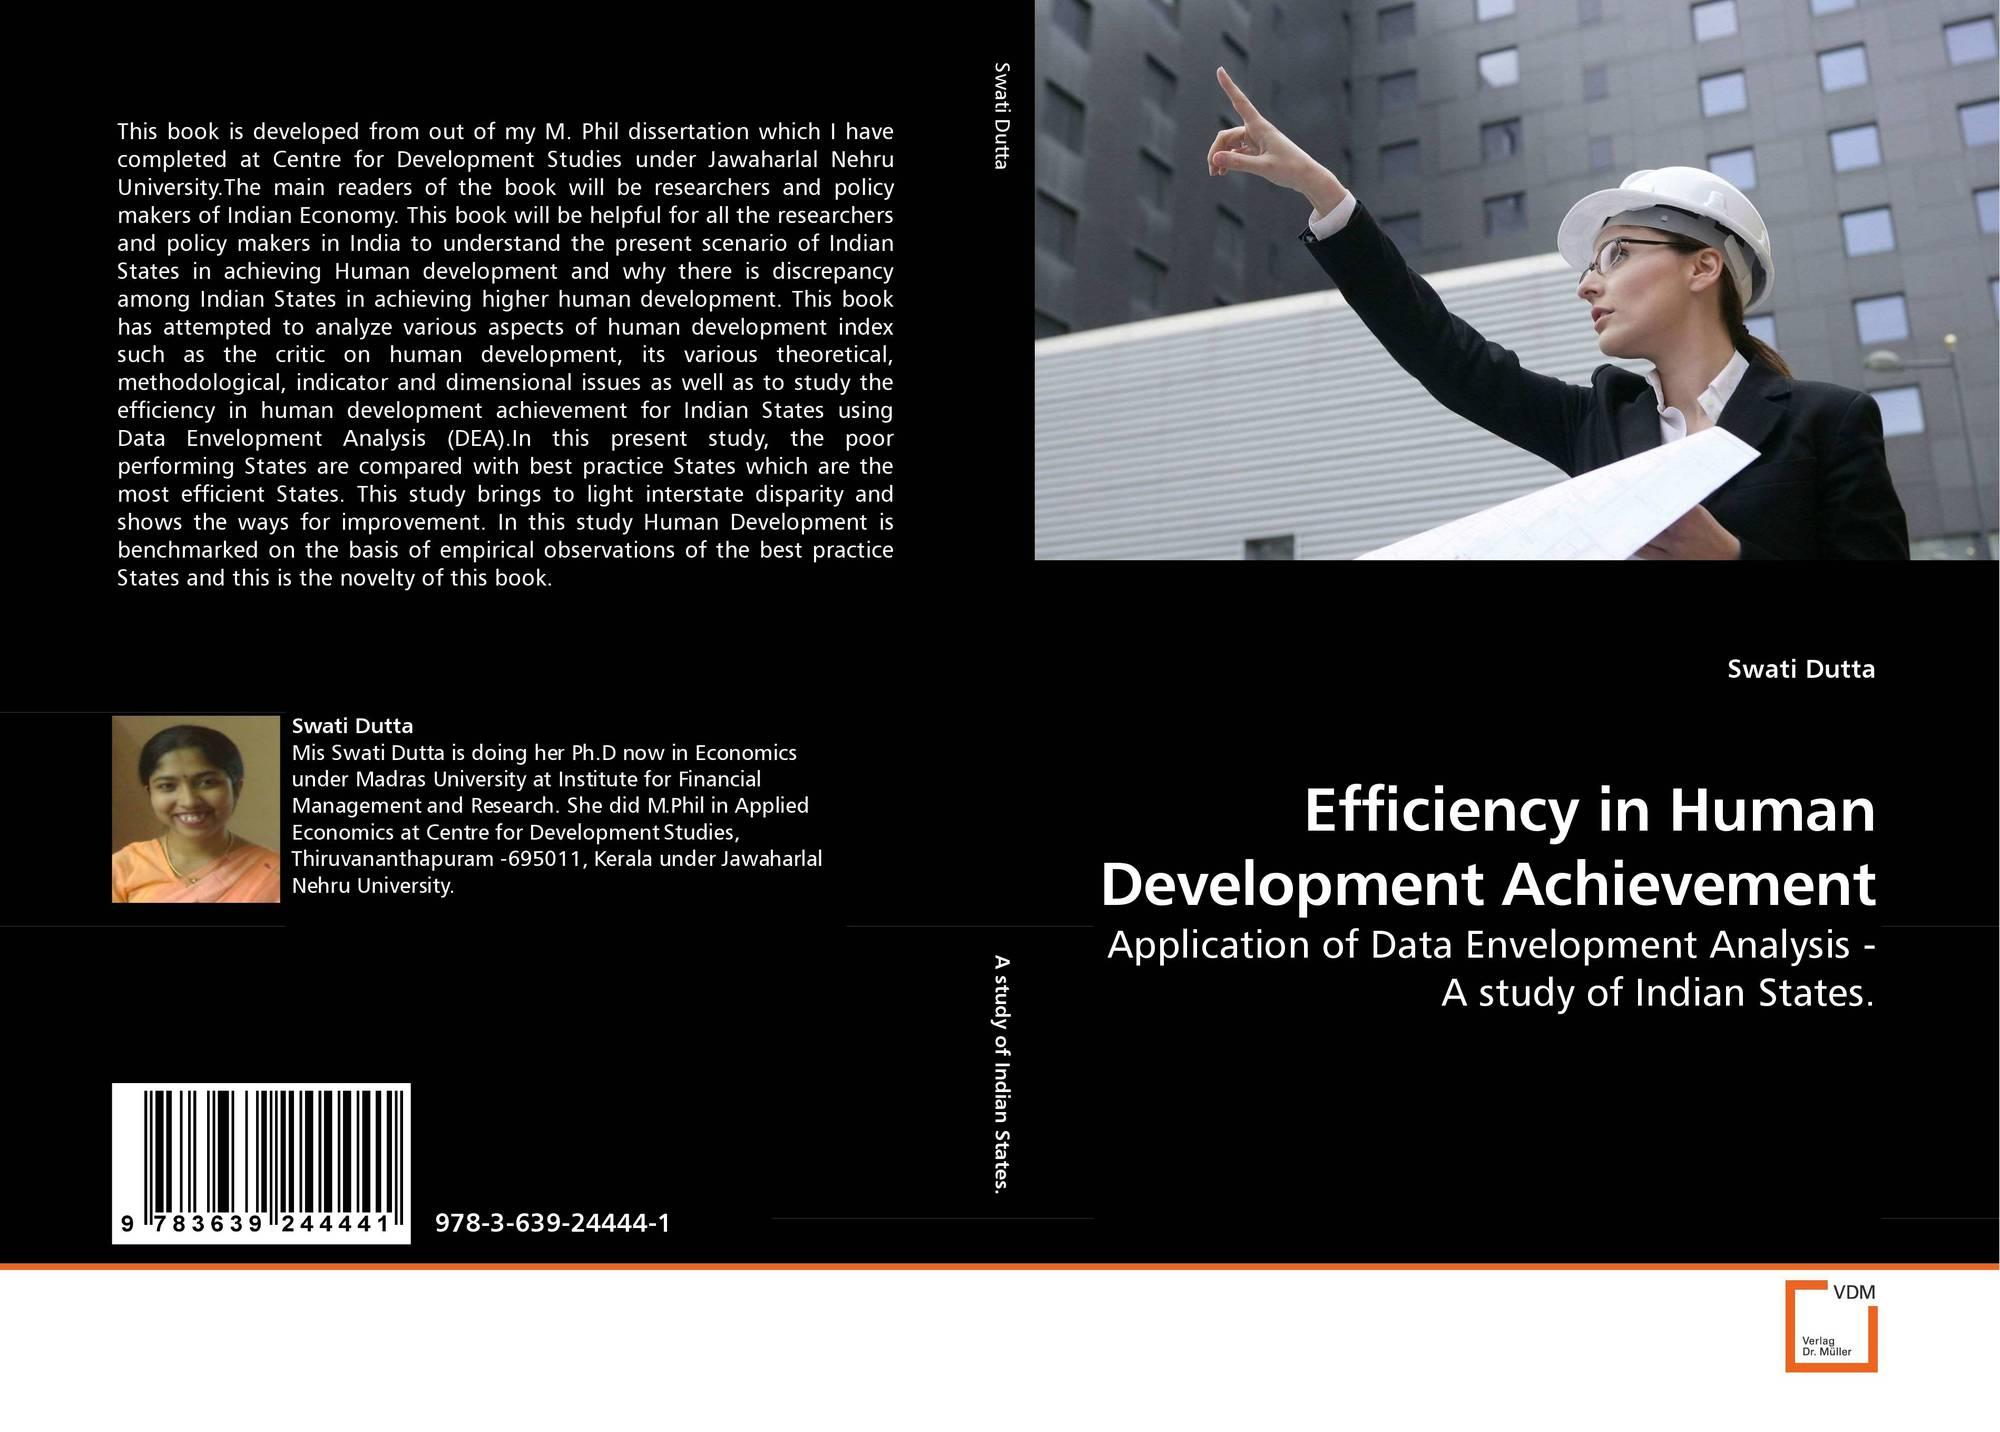 m phil dissertation